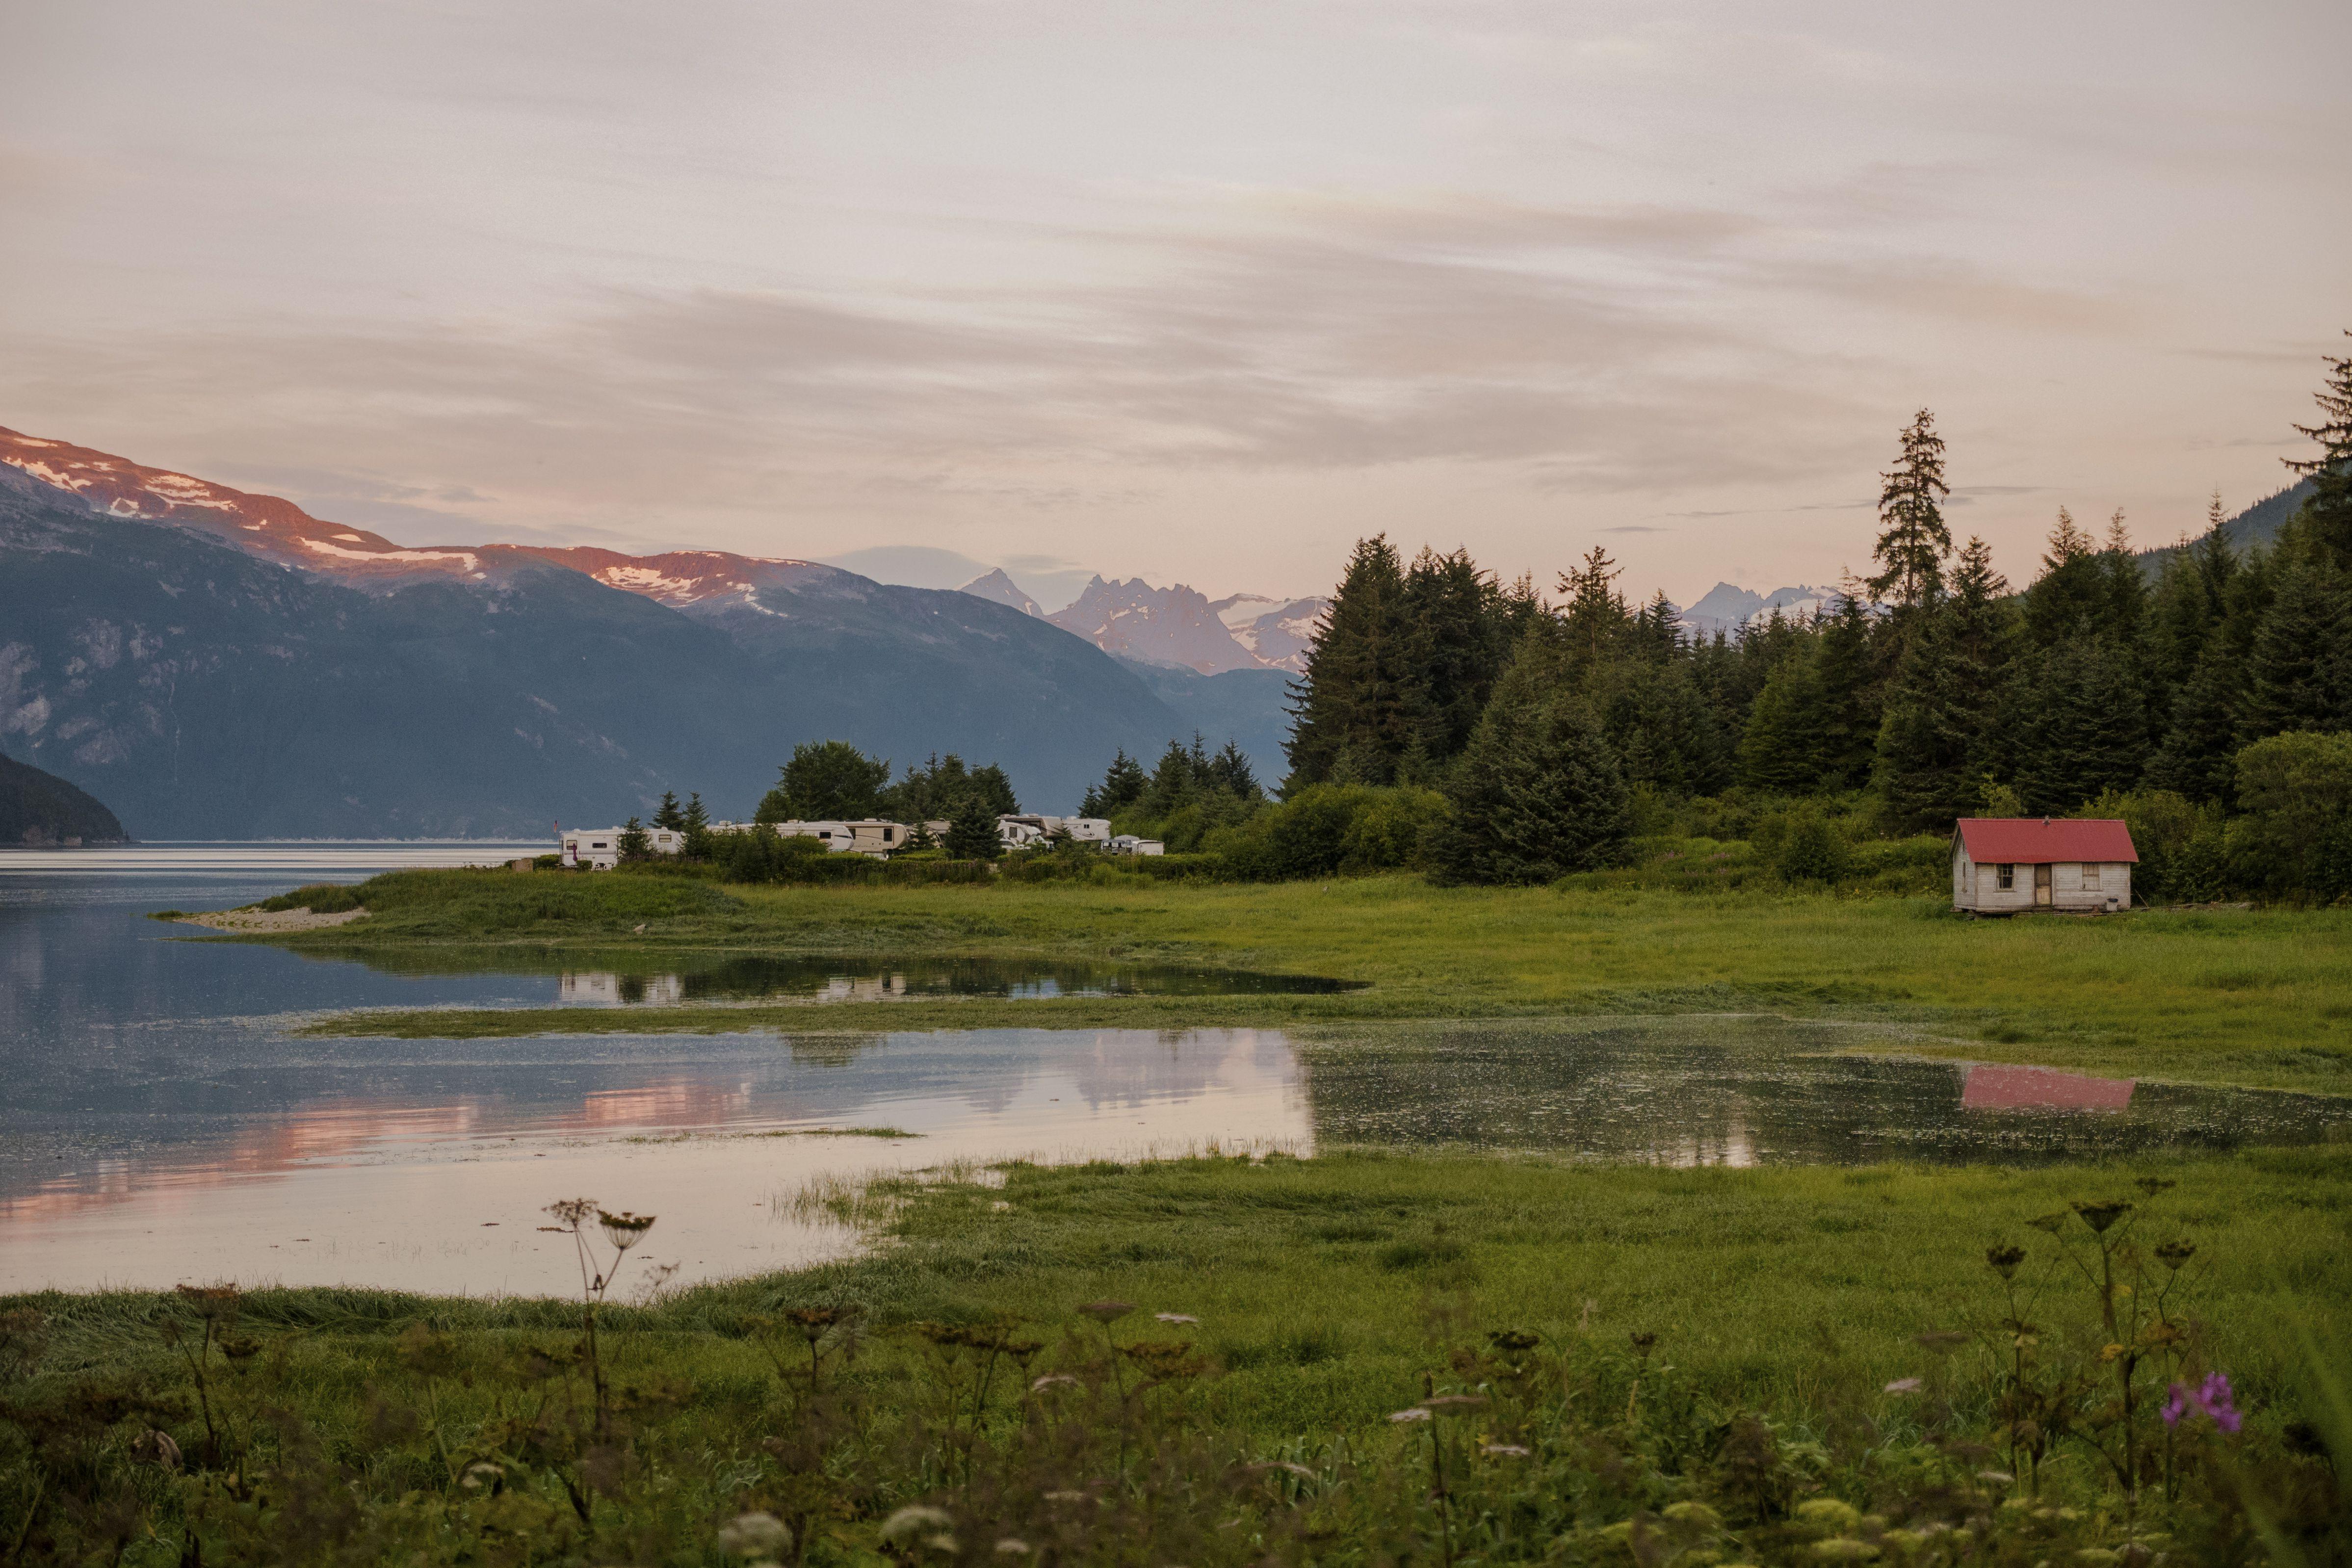 RV camping in Haines, Alaska